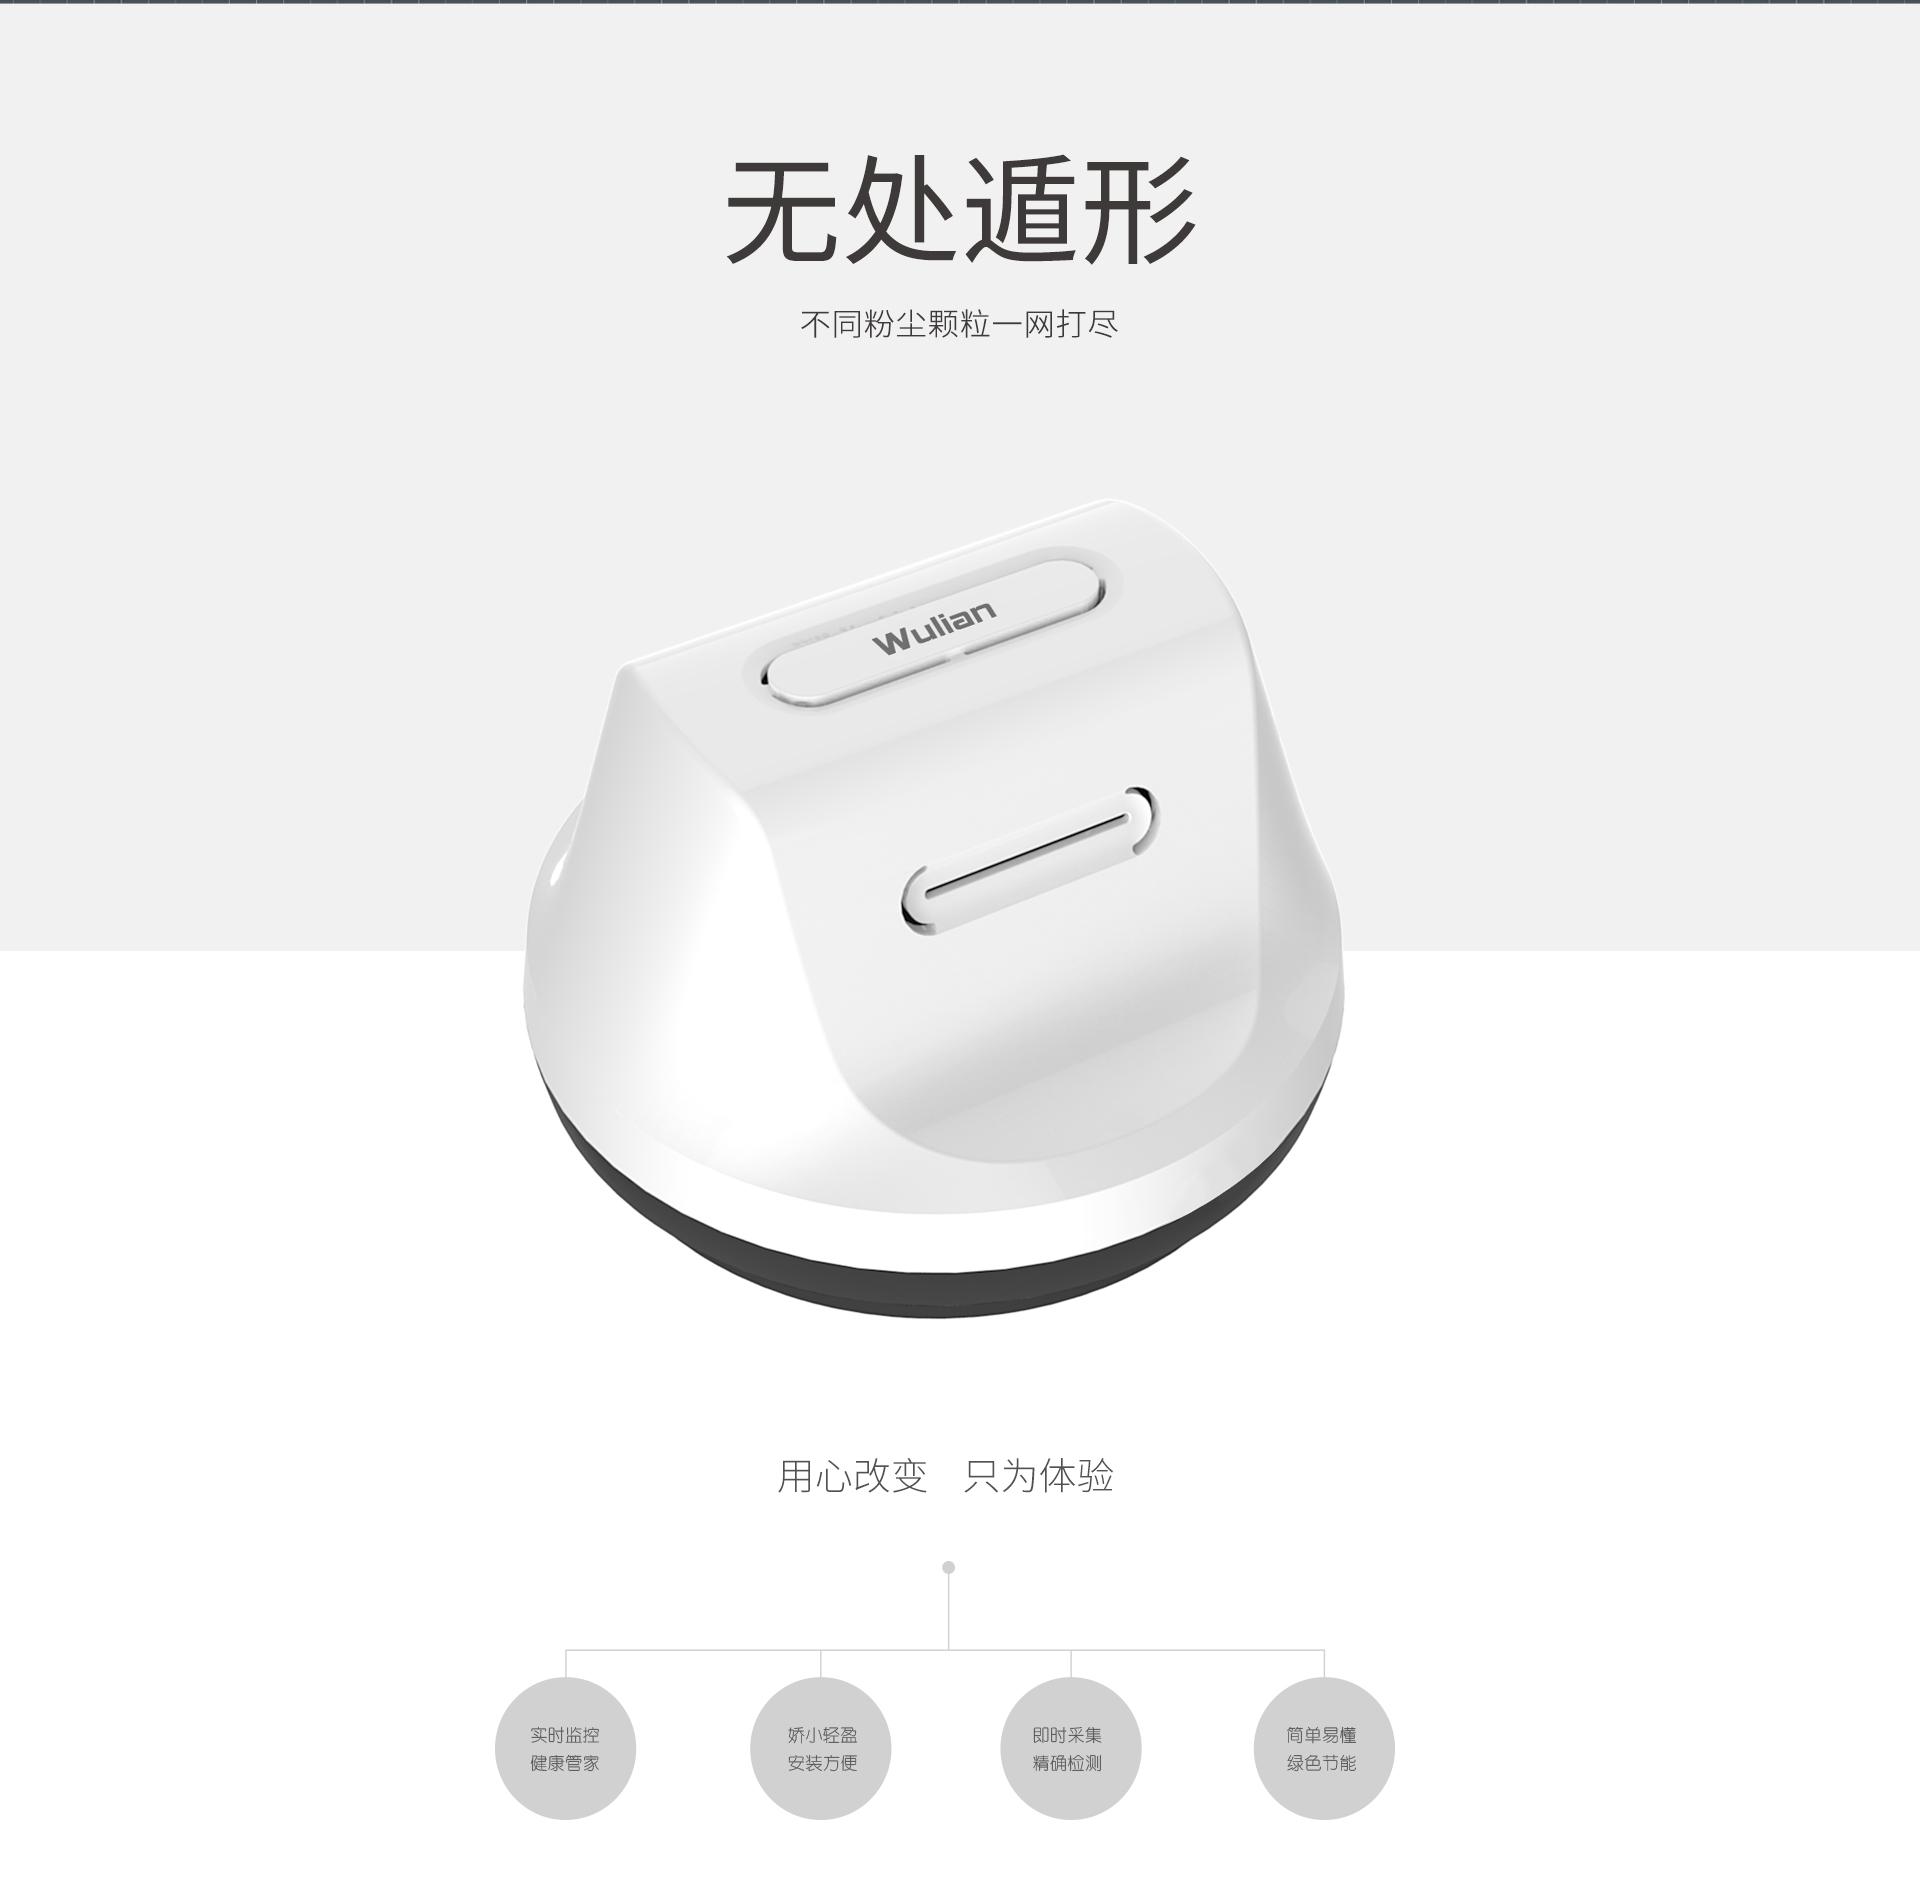 WL-粉尘监测器中文_03.jpg